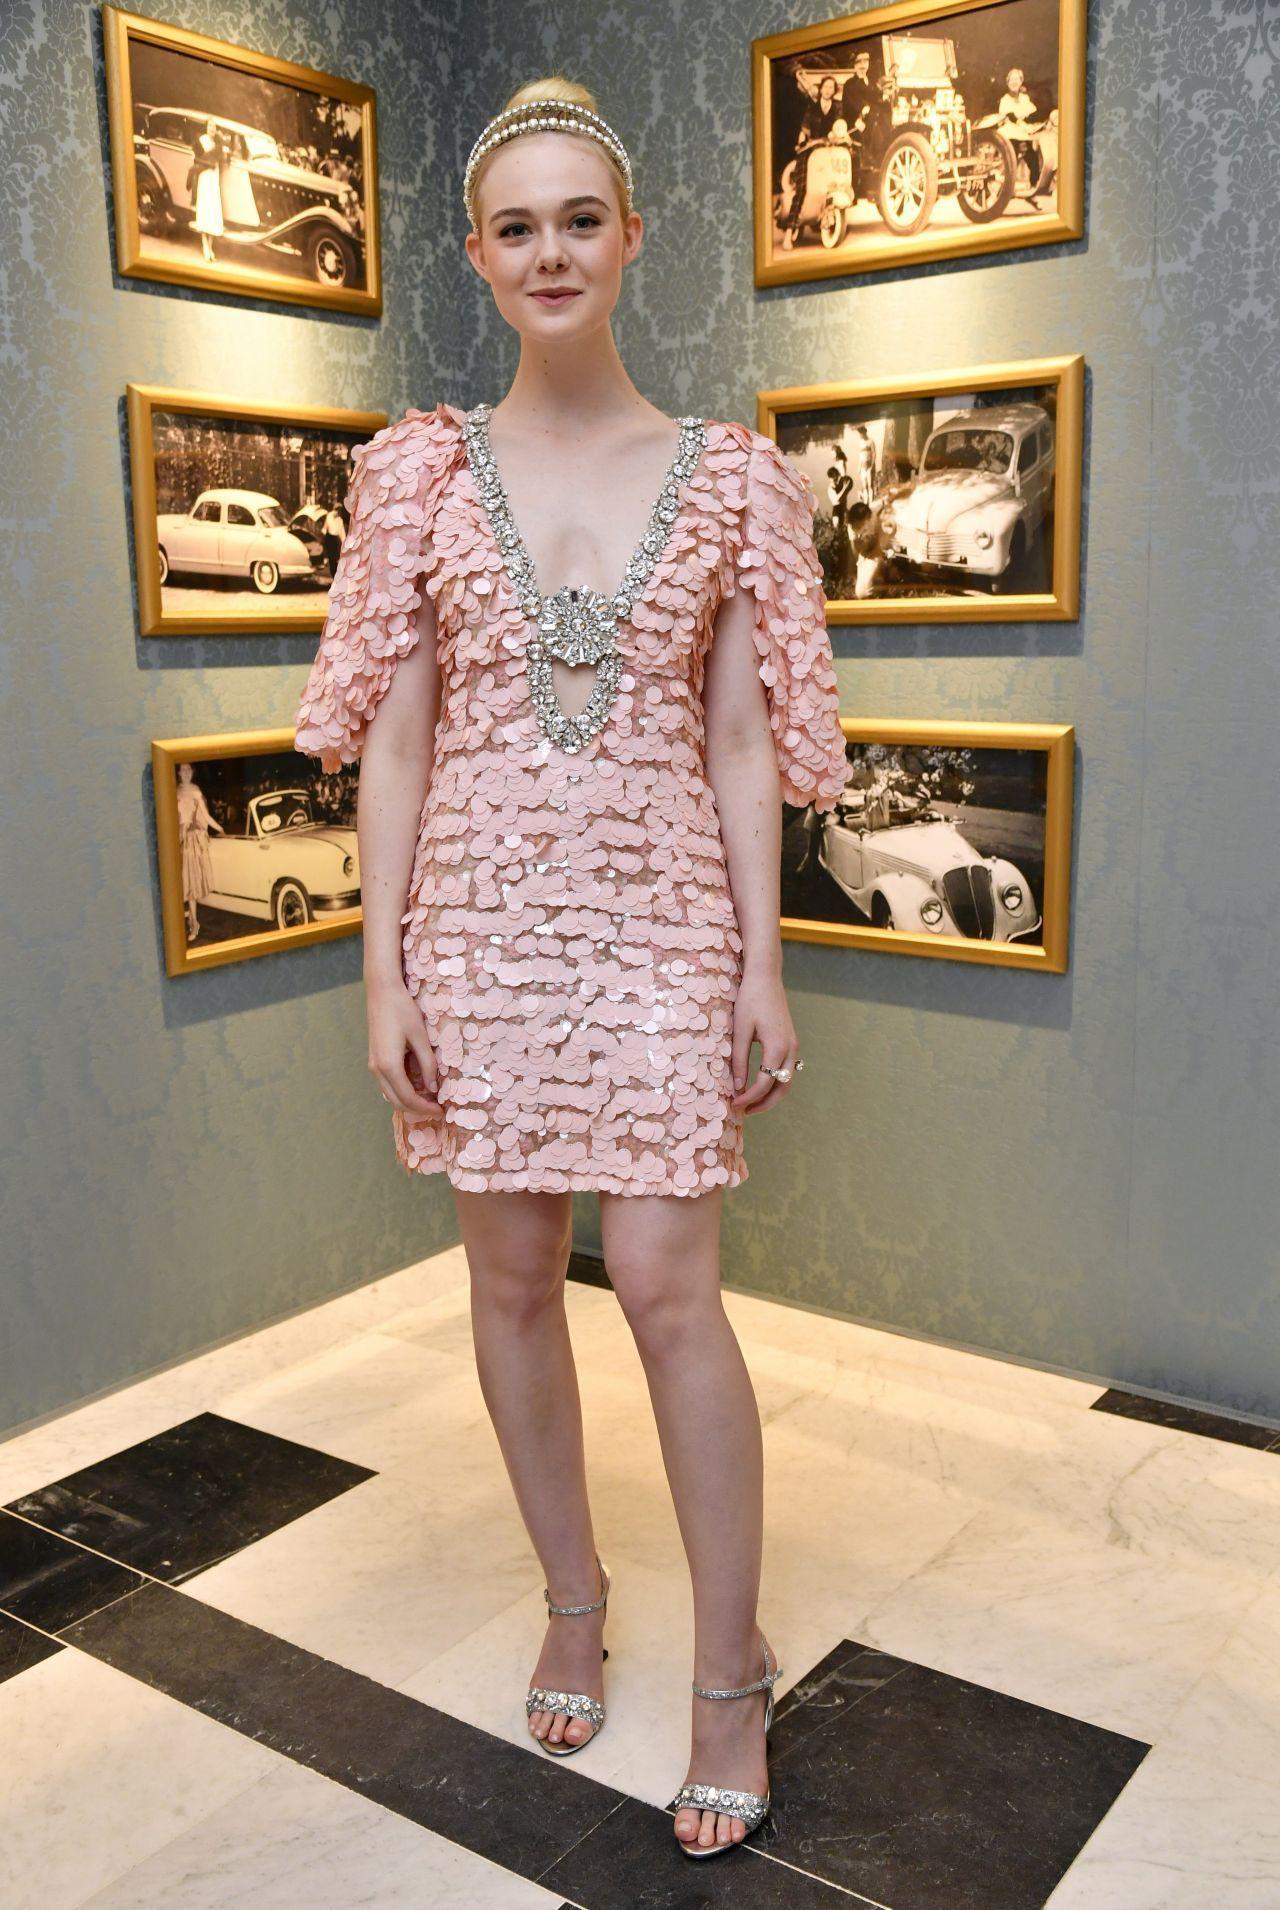 Elle fanning at miu miu dinner haute couture fashion week in paris